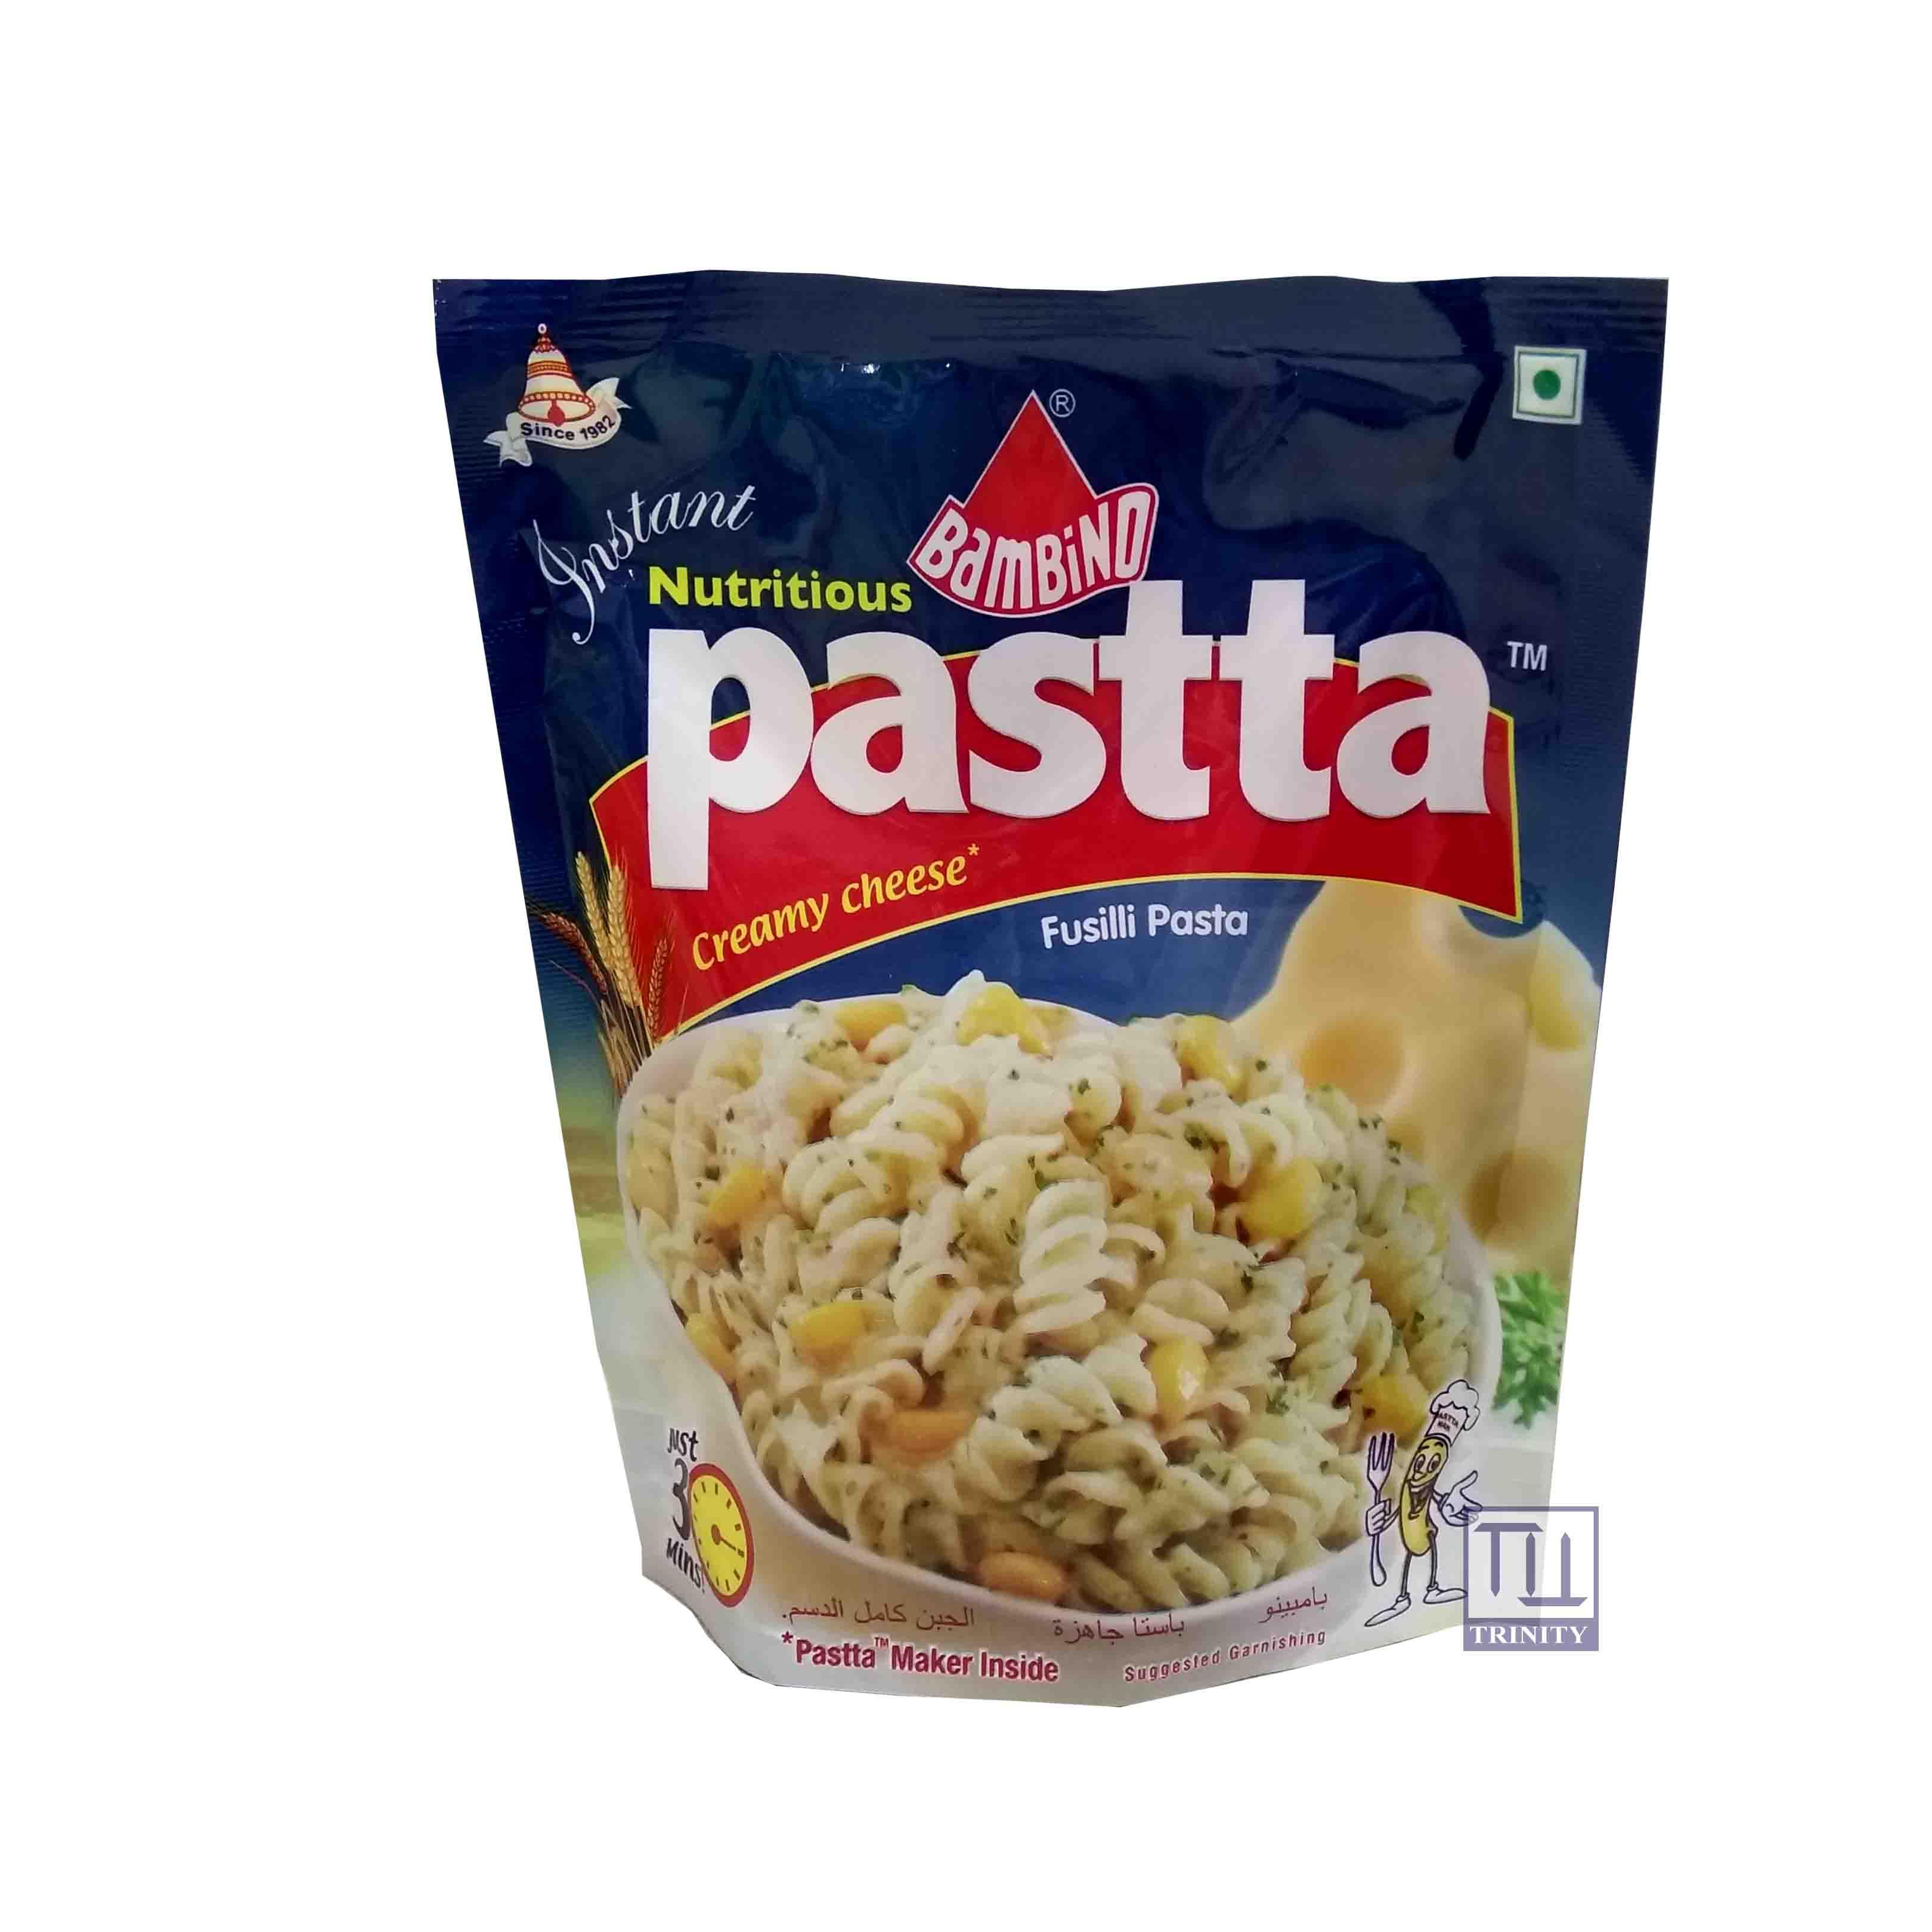 Bambino Instant Pasta Cheese Flavour 印度巴比諾即時調理粉 (起司口味)